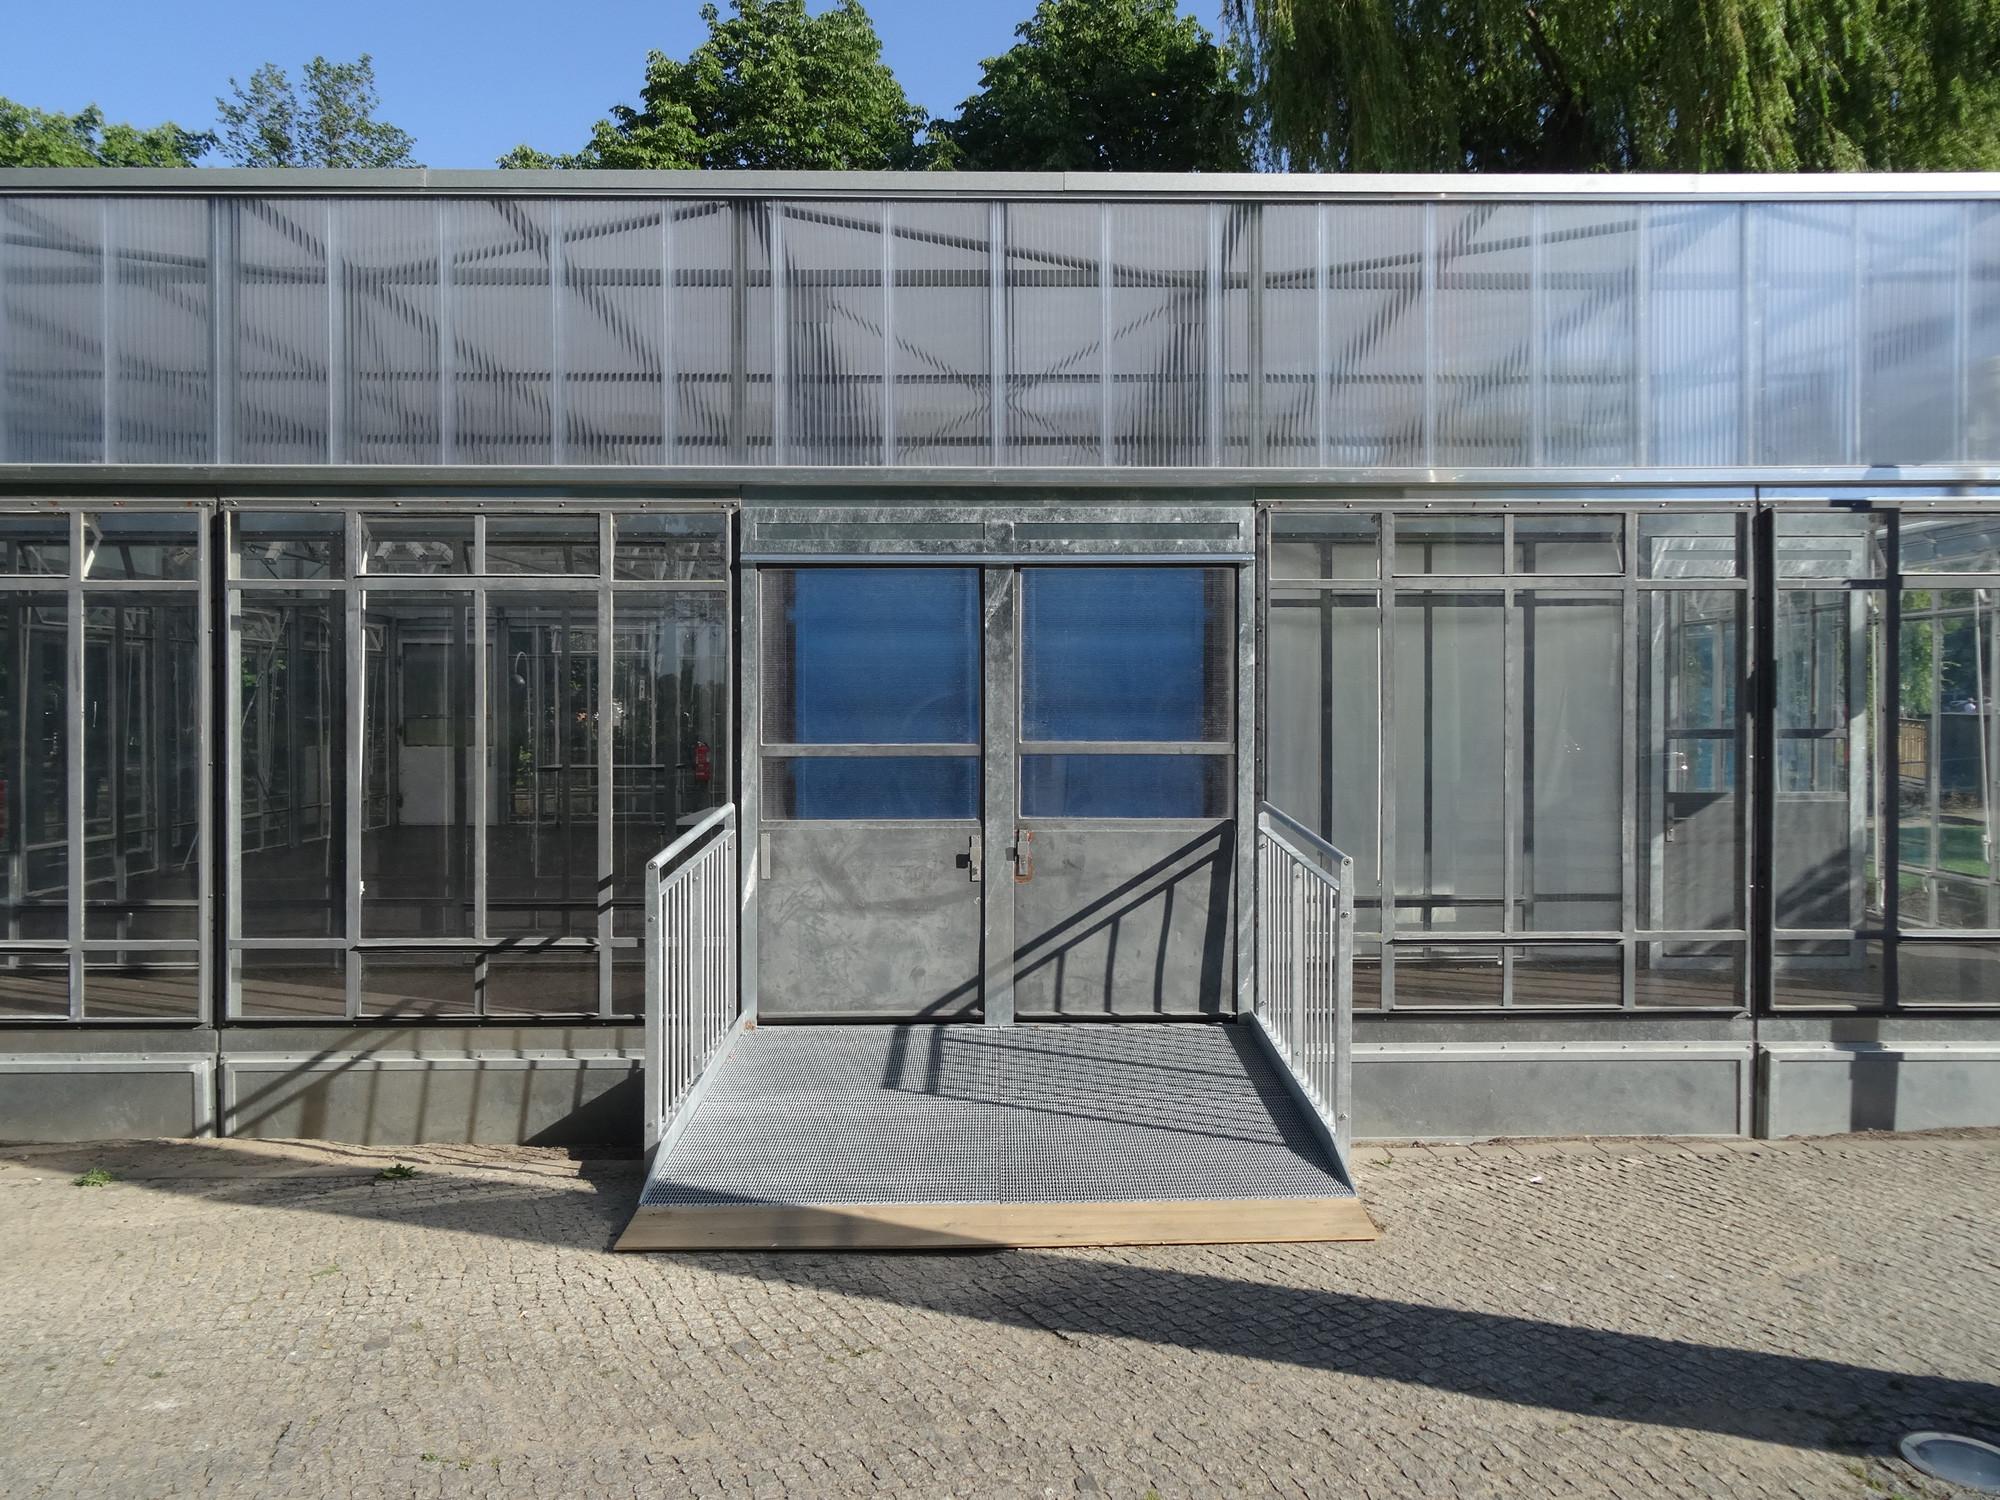 tempor rer bauhaus pavillon in berlin bauphysik sonderbauten baunetz wissen. Black Bedroom Furniture Sets. Home Design Ideas